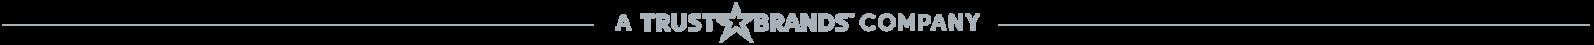 Trust Brands Company